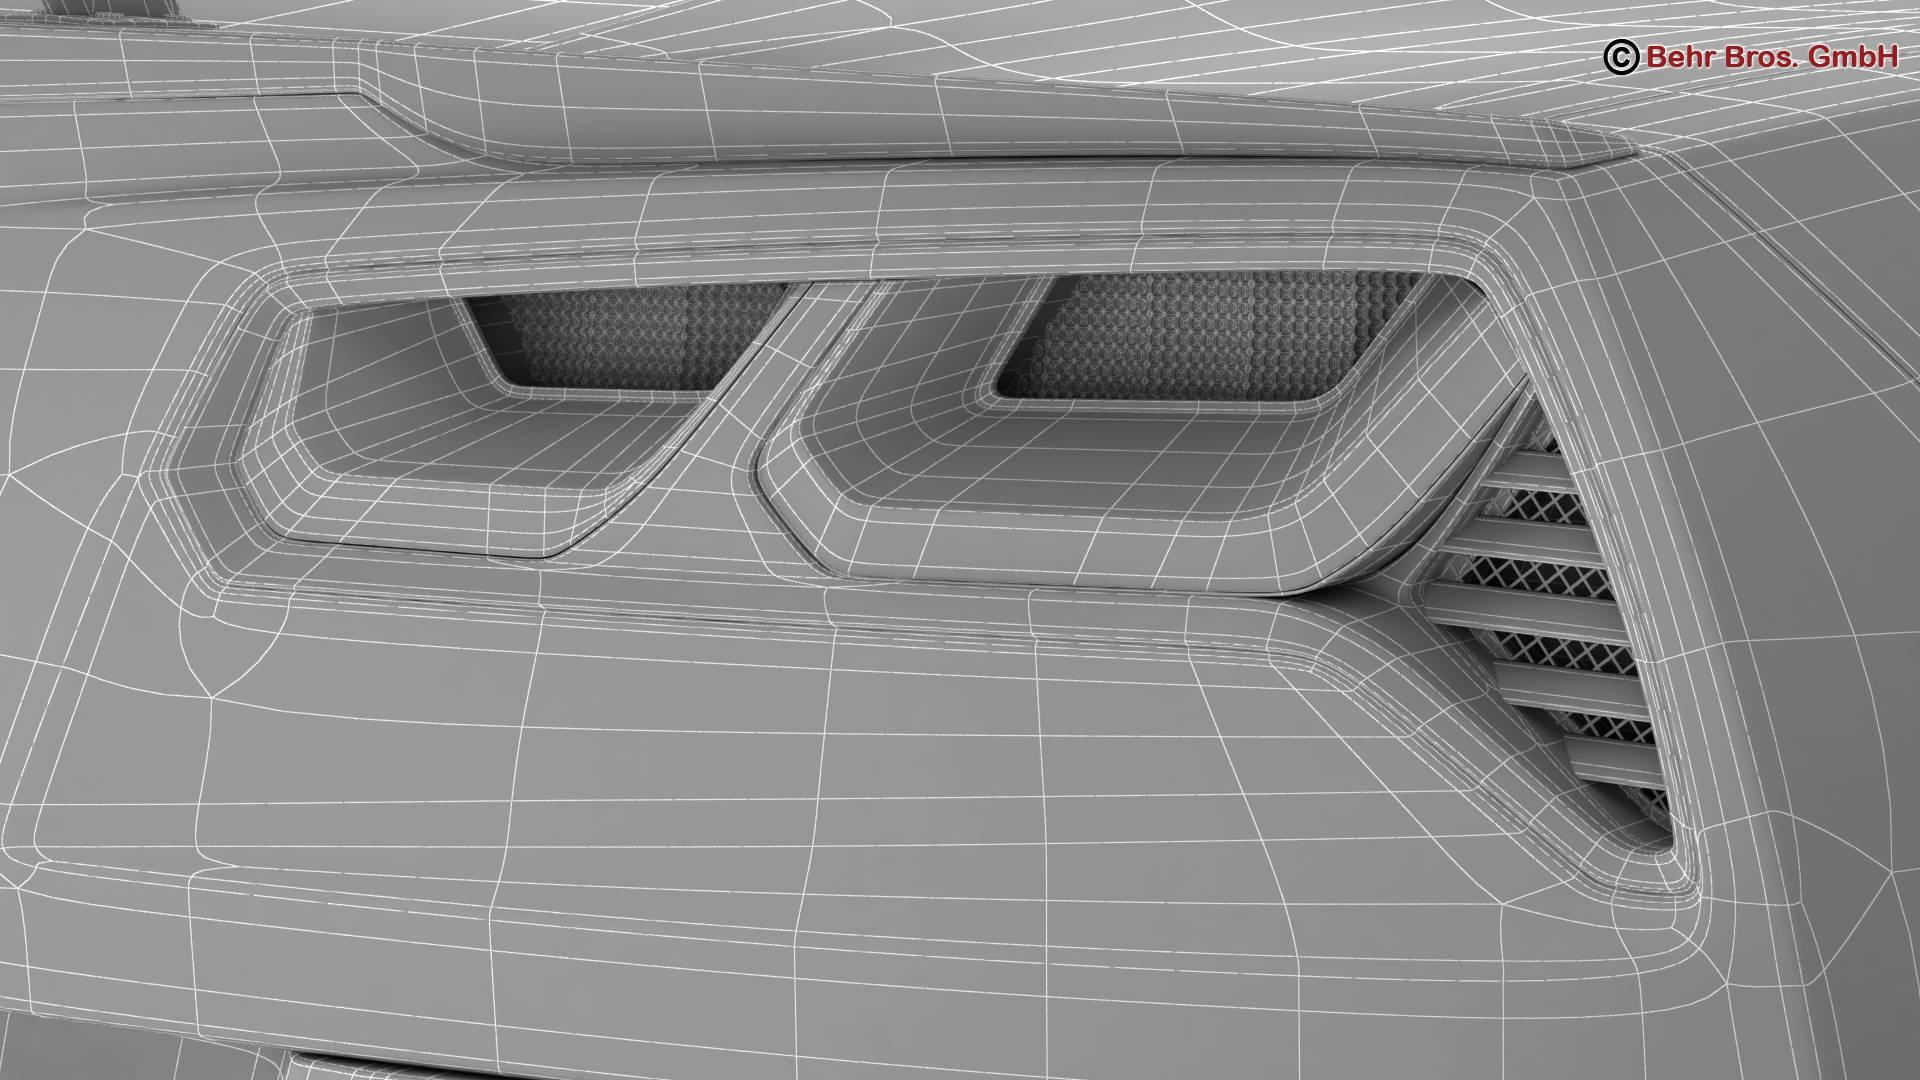 chevrolet corvette zr1 2019 3d model 3ds max fbx c4d lwo ma mb obj 275991